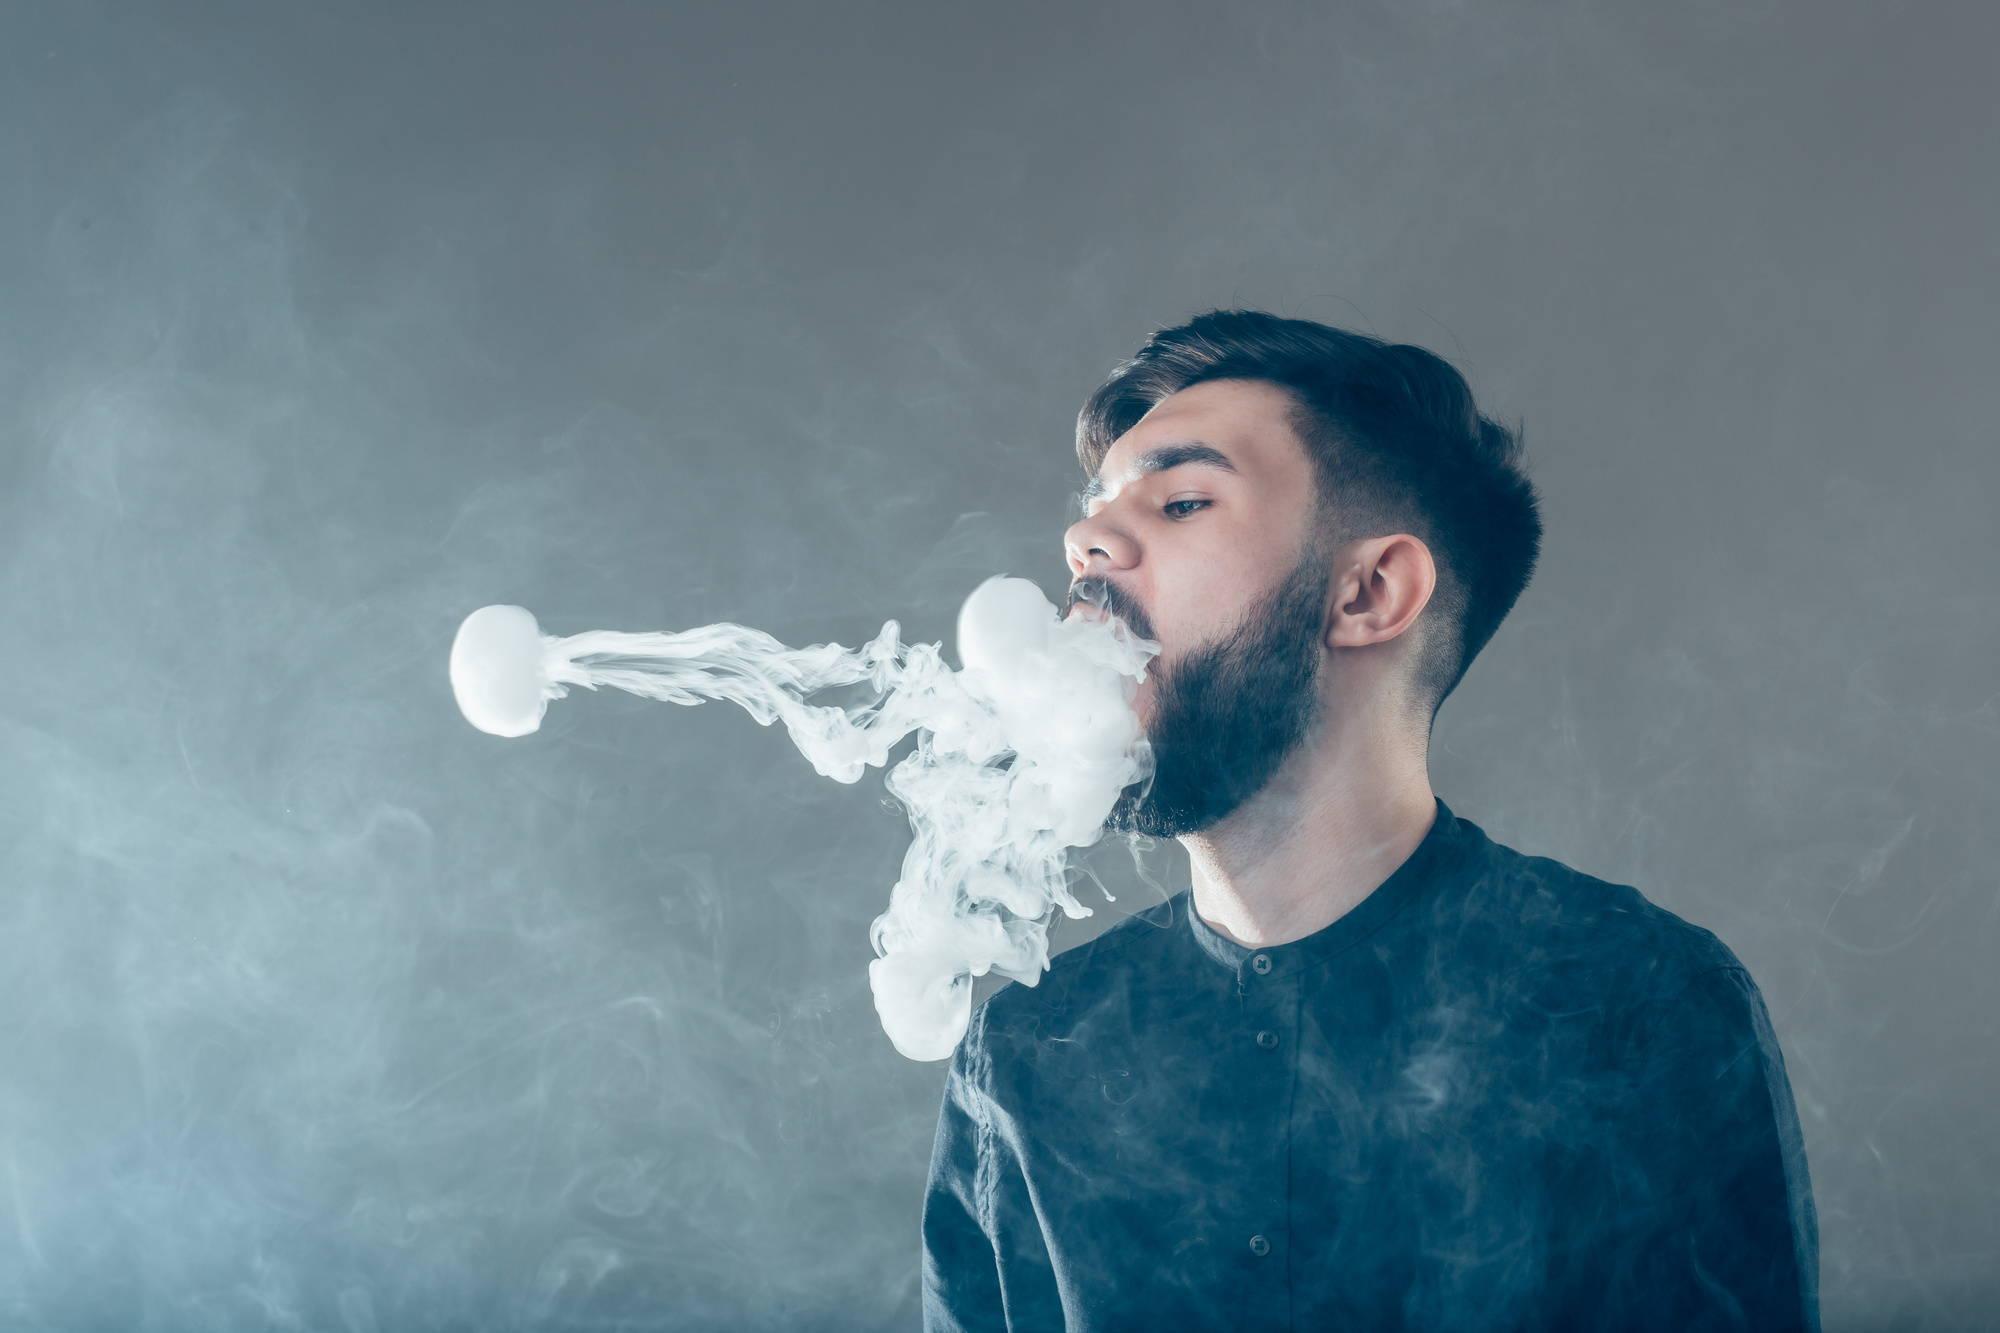 Man blowing beautiful smoke rings